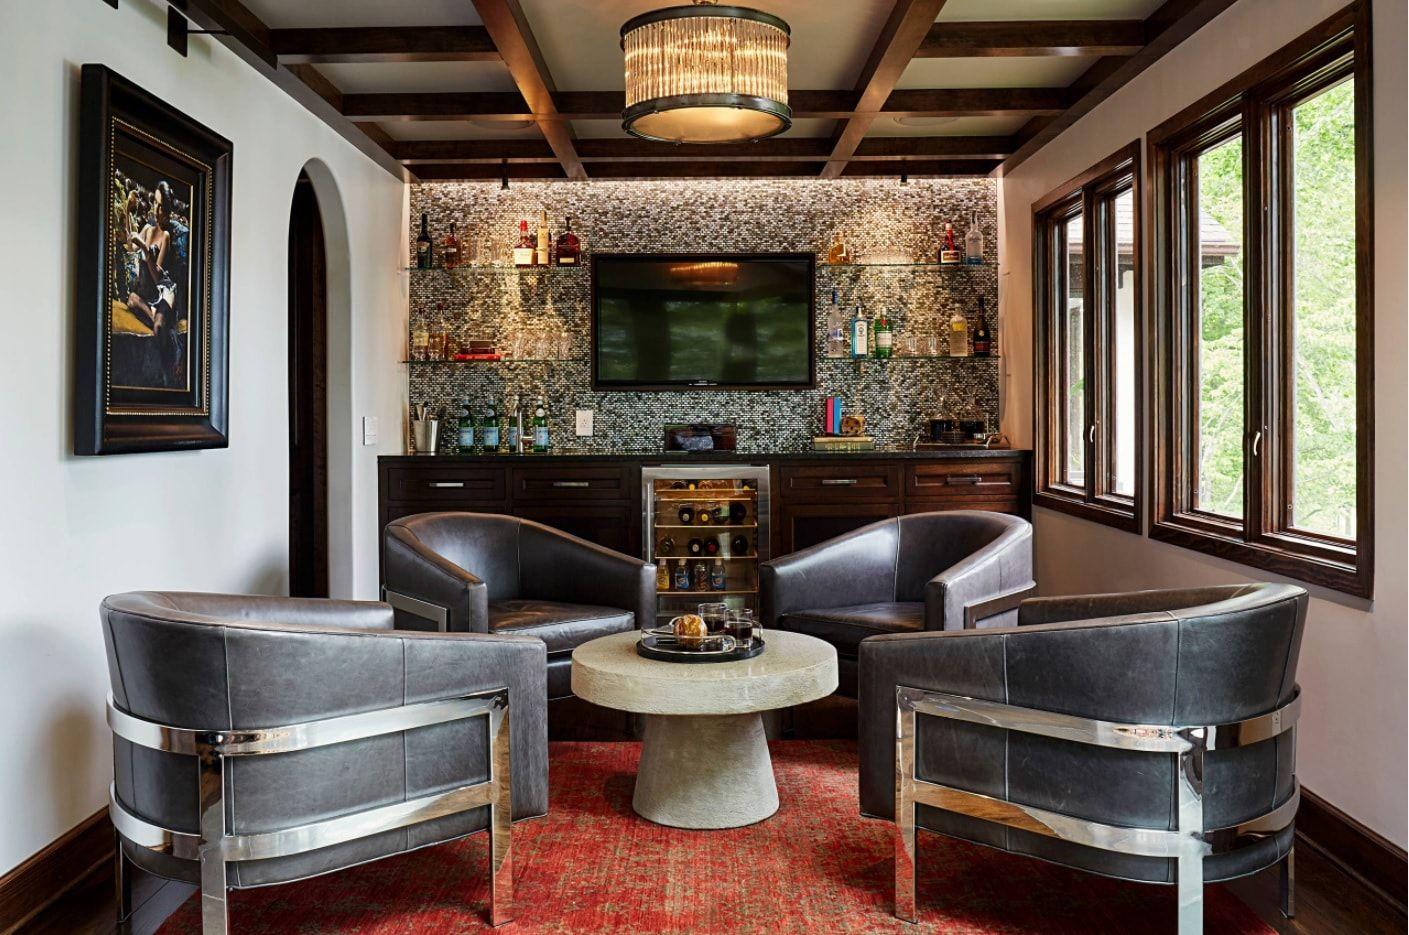 Modern Steampunk House Interior Photo Examples Small Design Ideas